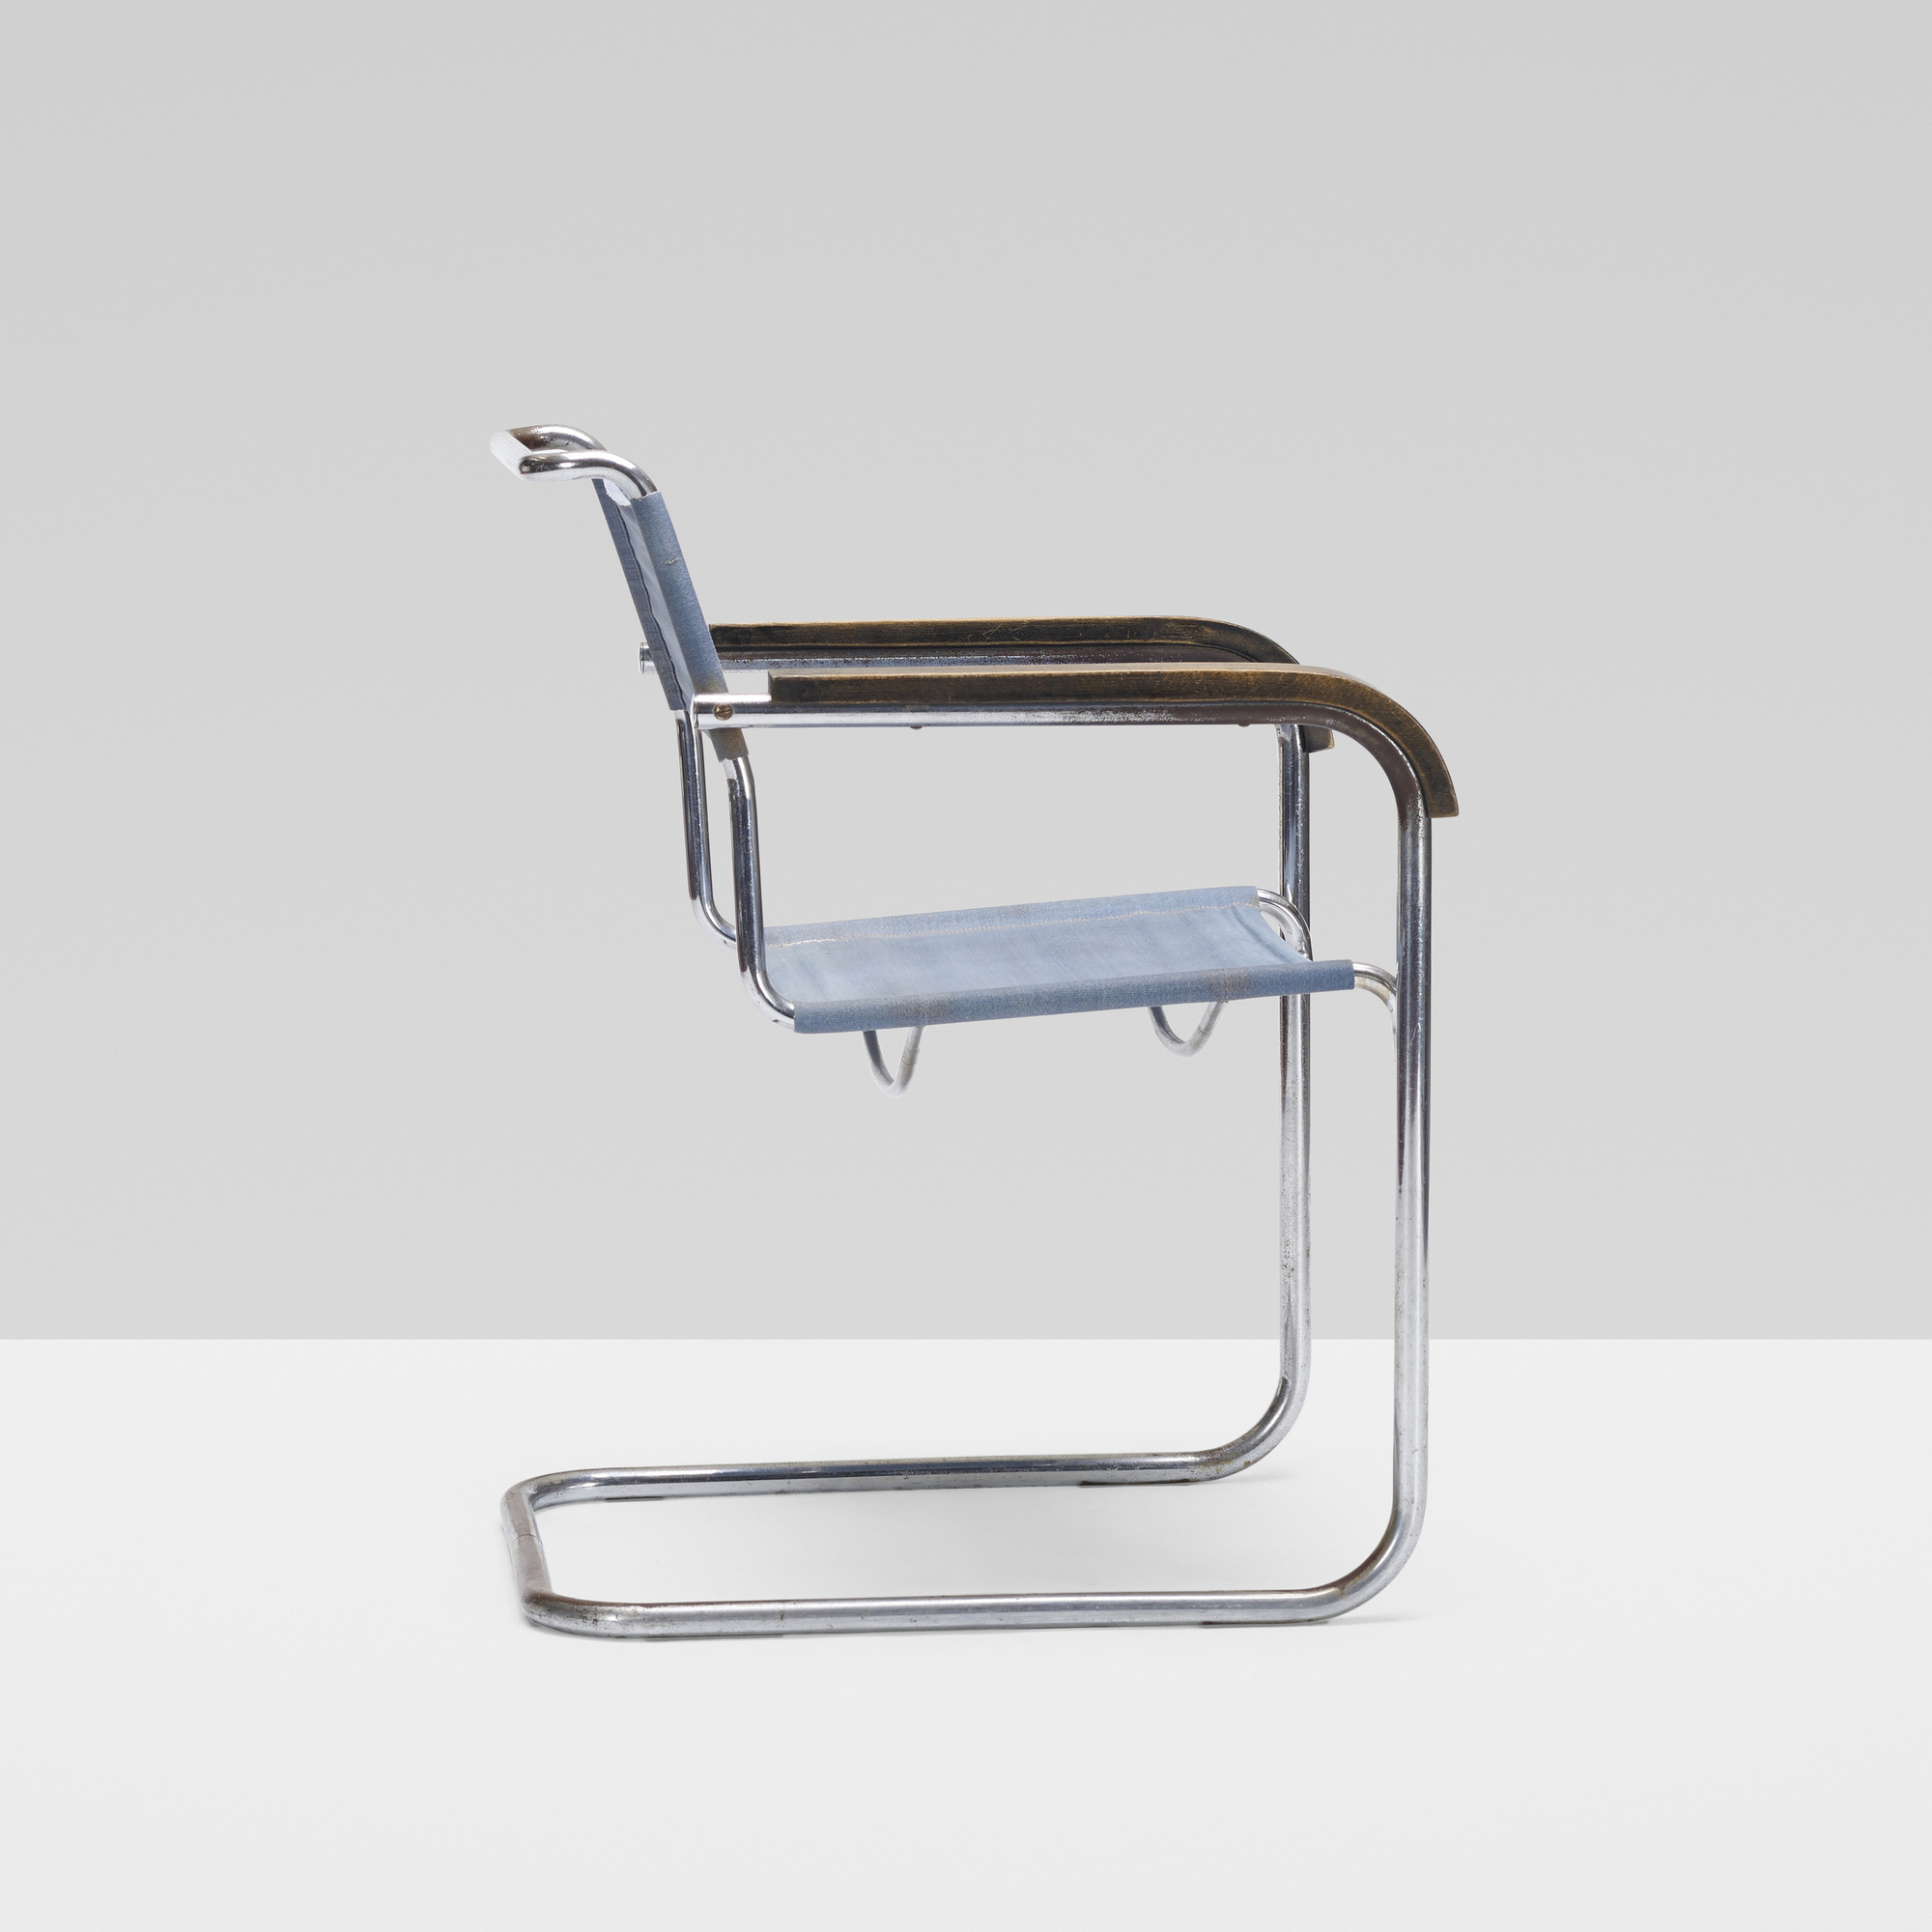 149: Marcel Breuer / armchair, model B32 (3 of 4)